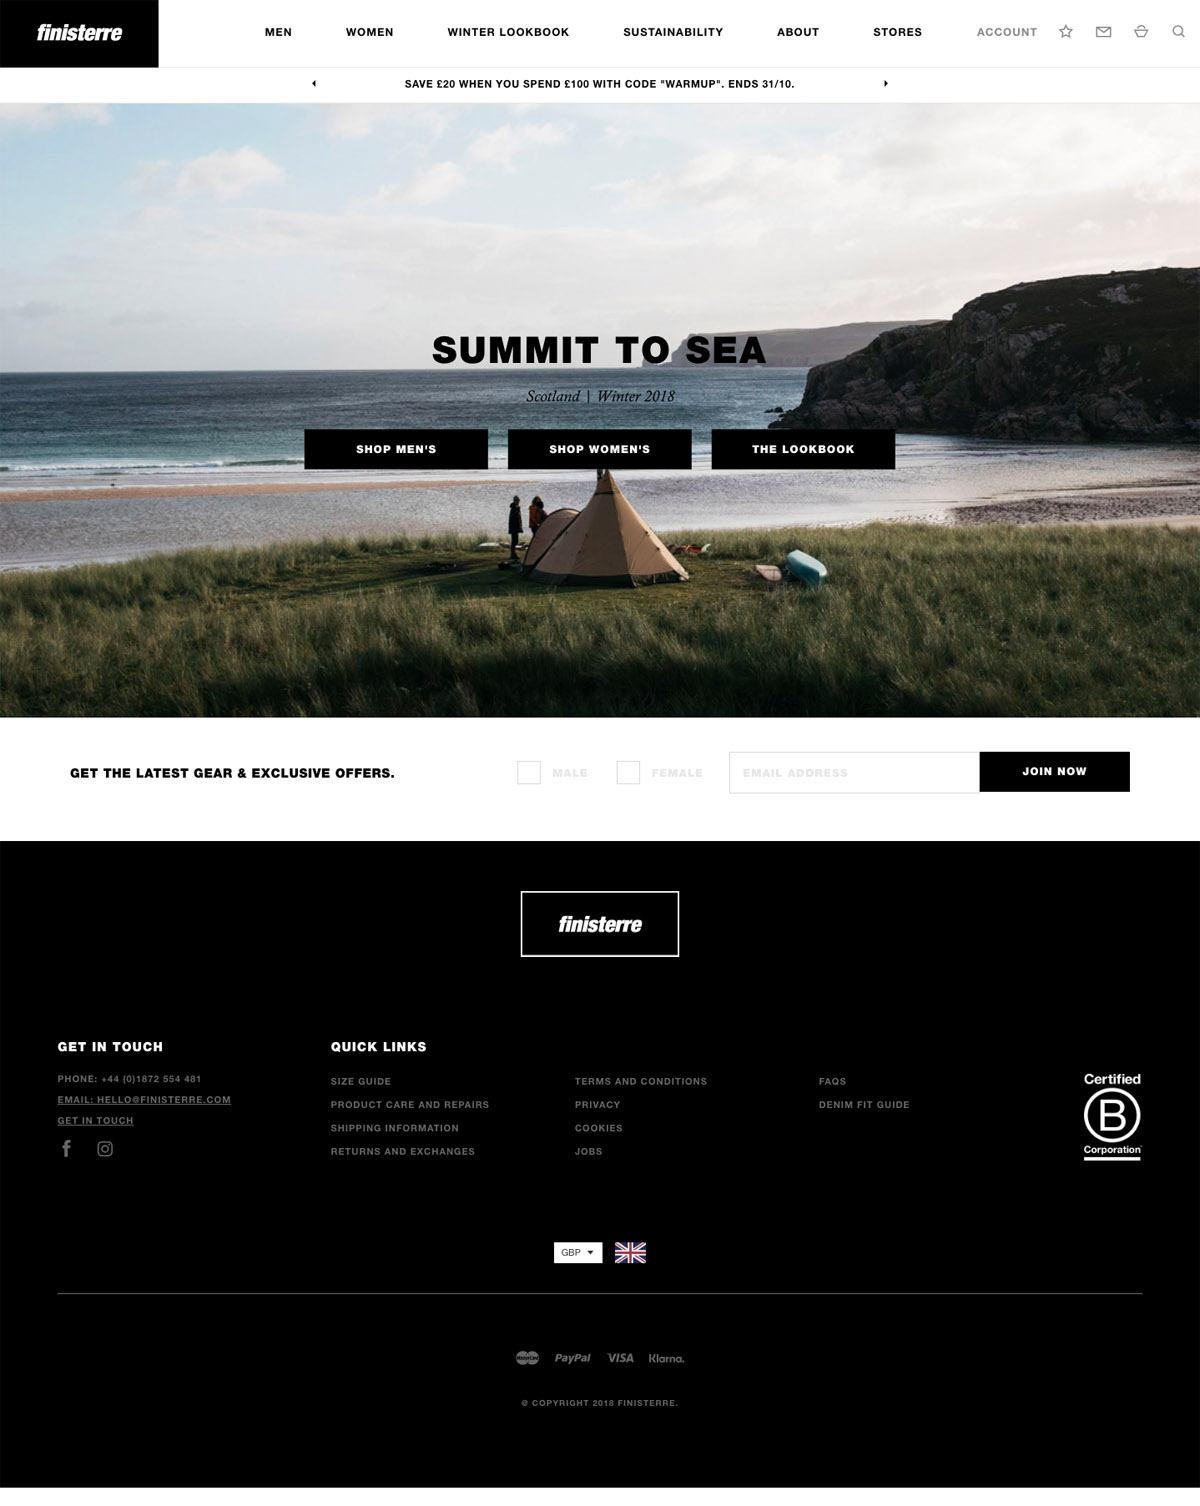 eCommerce website: Finisterre